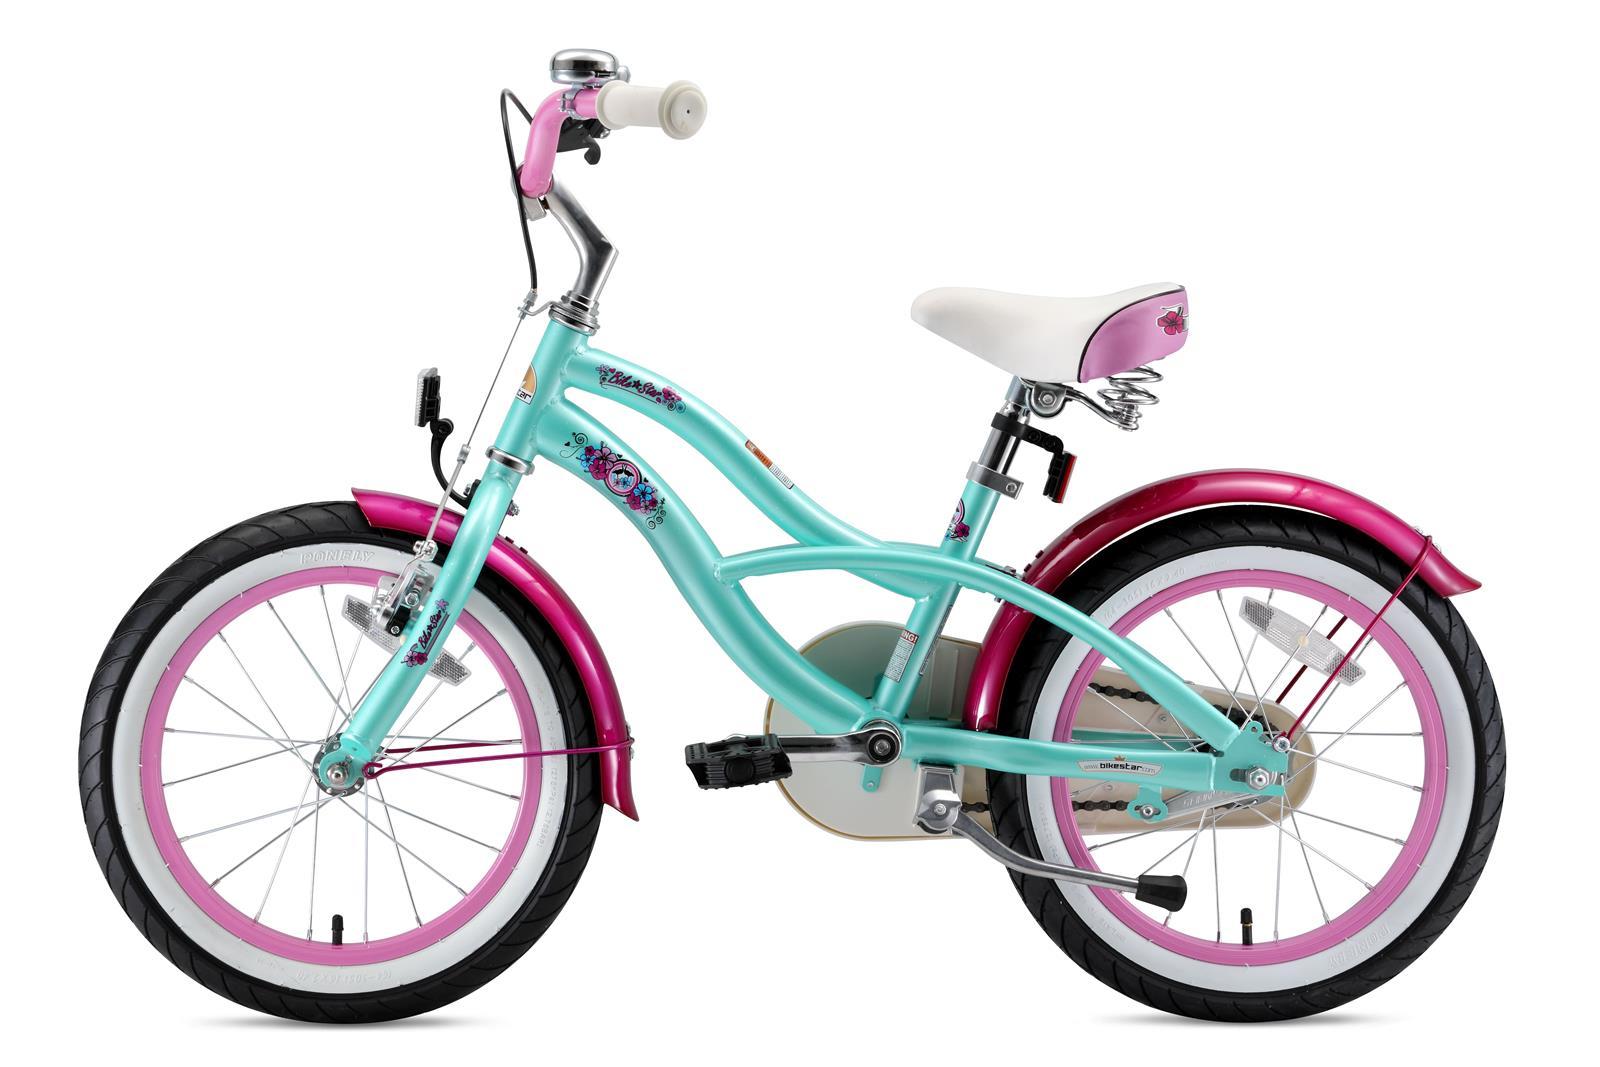 bi 16 cr 01 mint bikestar 16 zoll kindercruiser mint. Black Bedroom Furniture Sets. Home Design Ideas